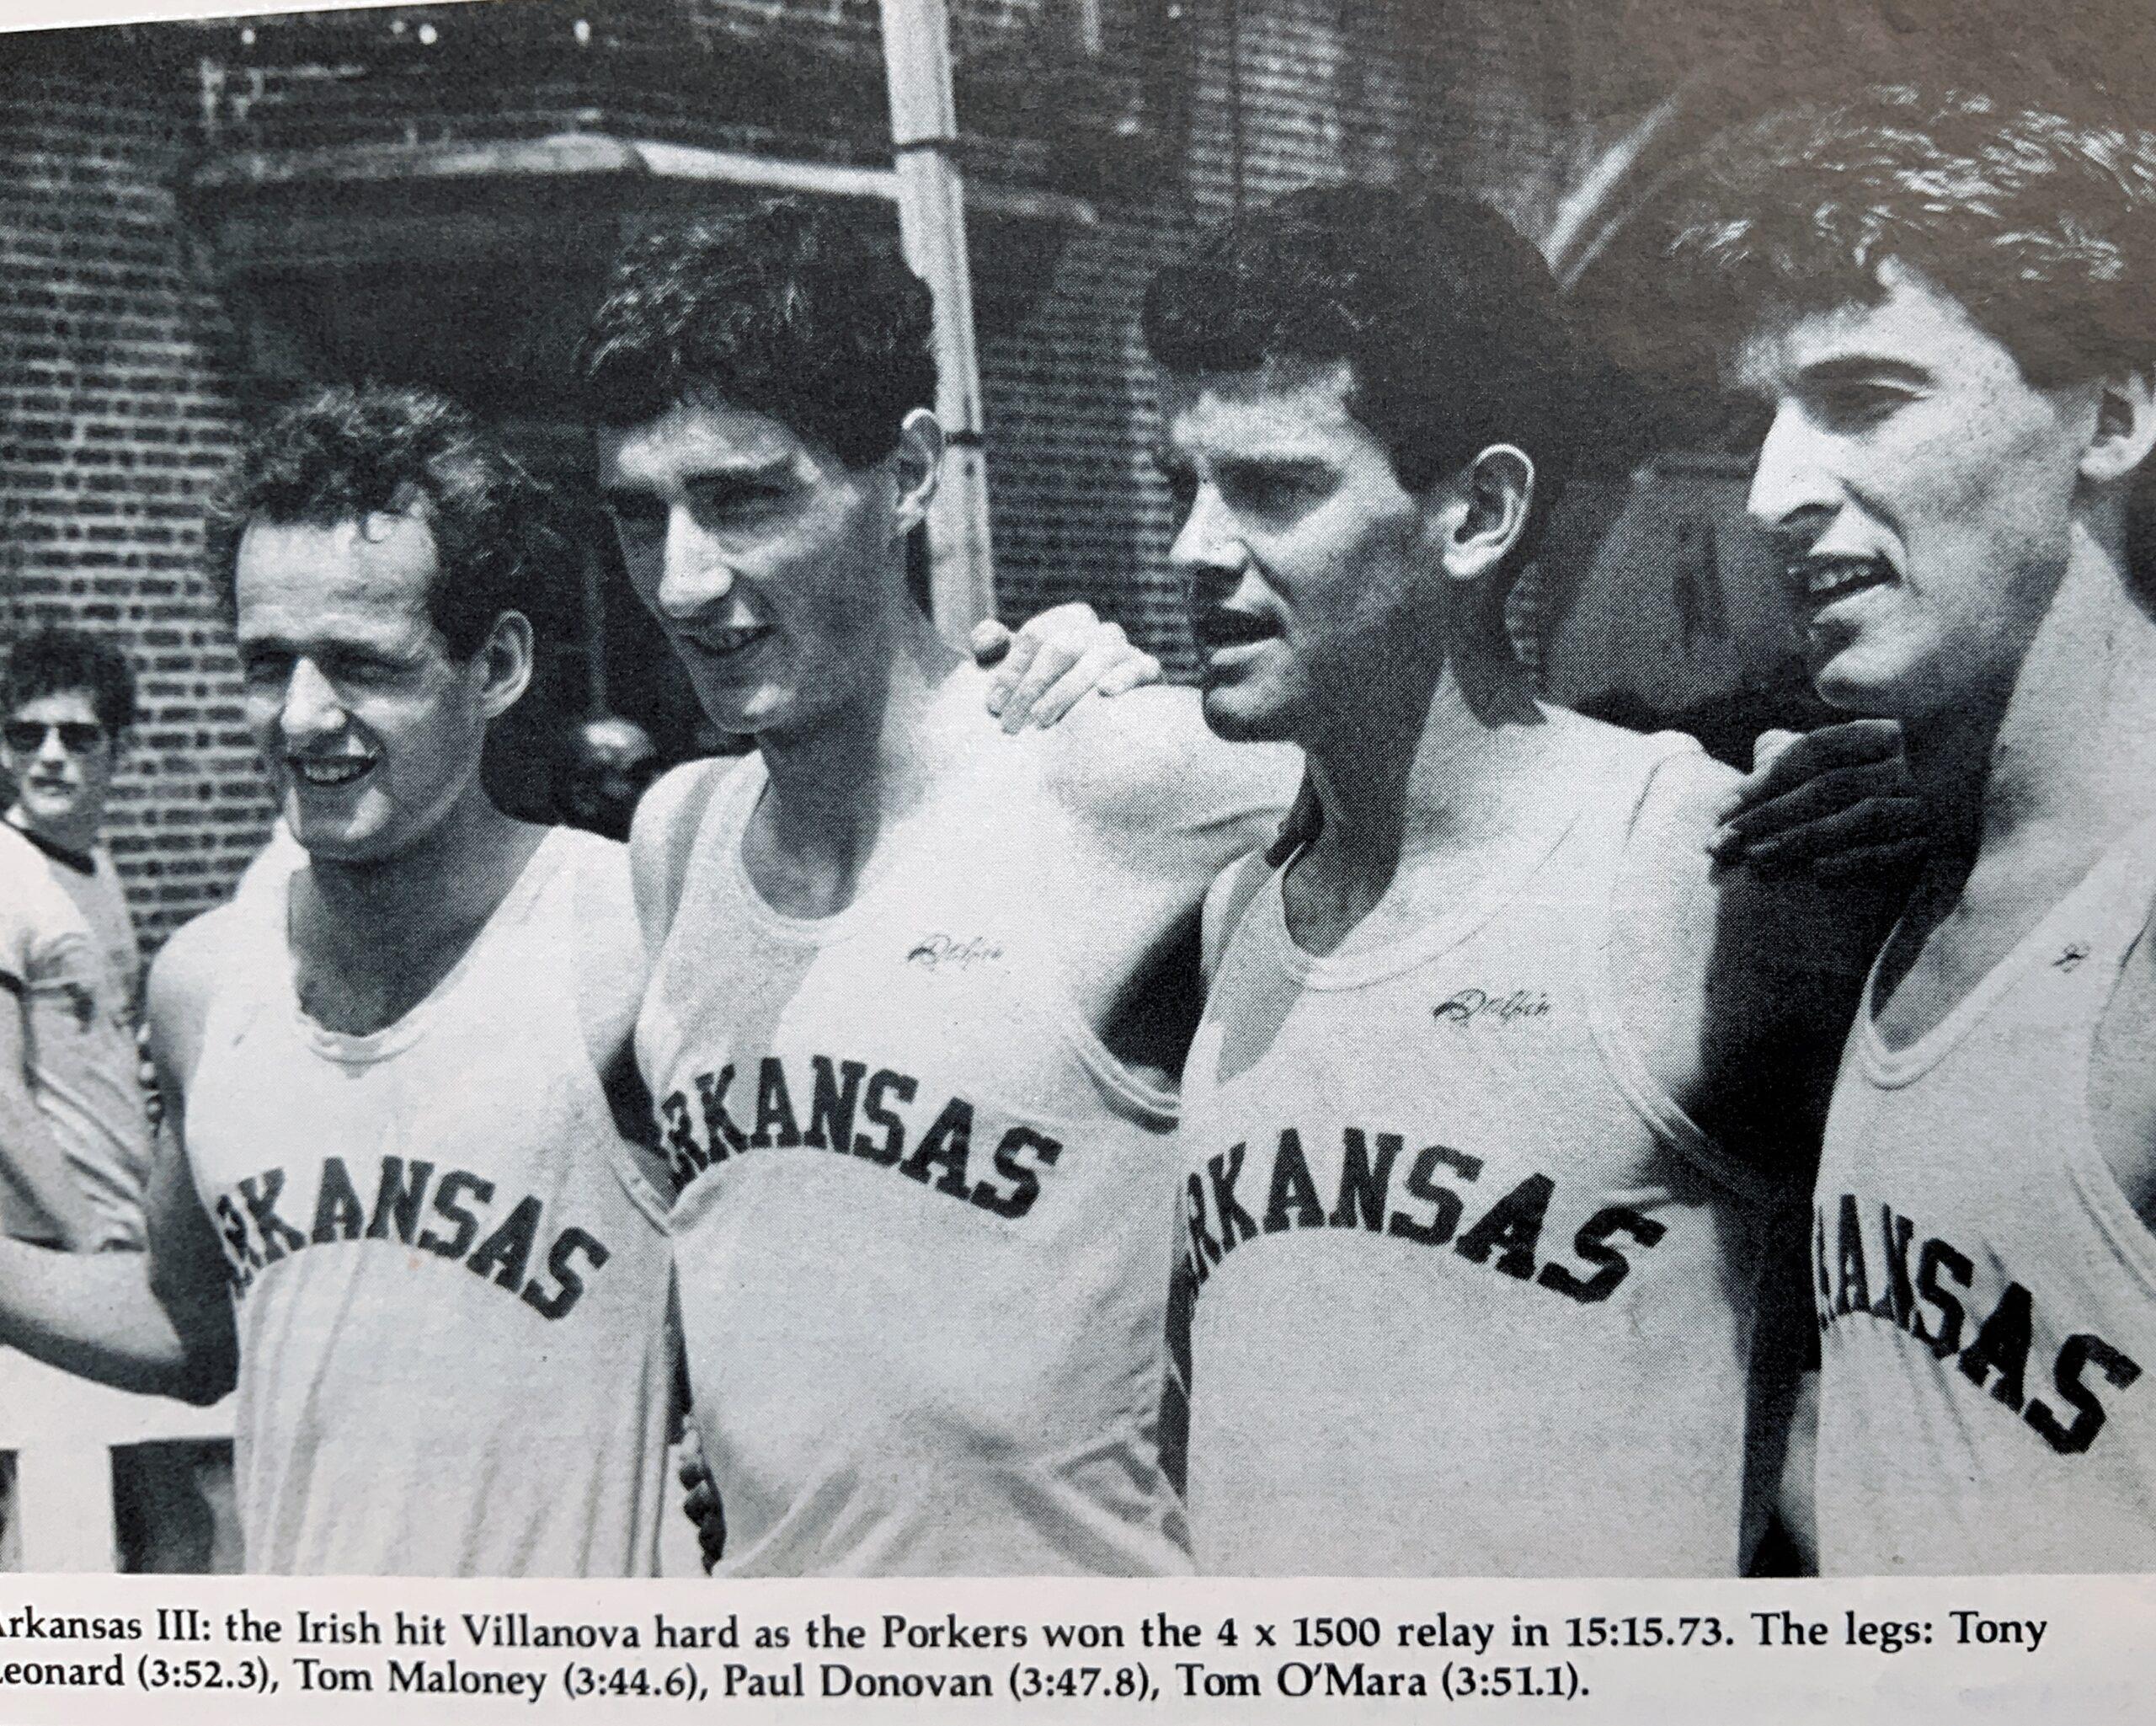 1983 - 4 x 1500